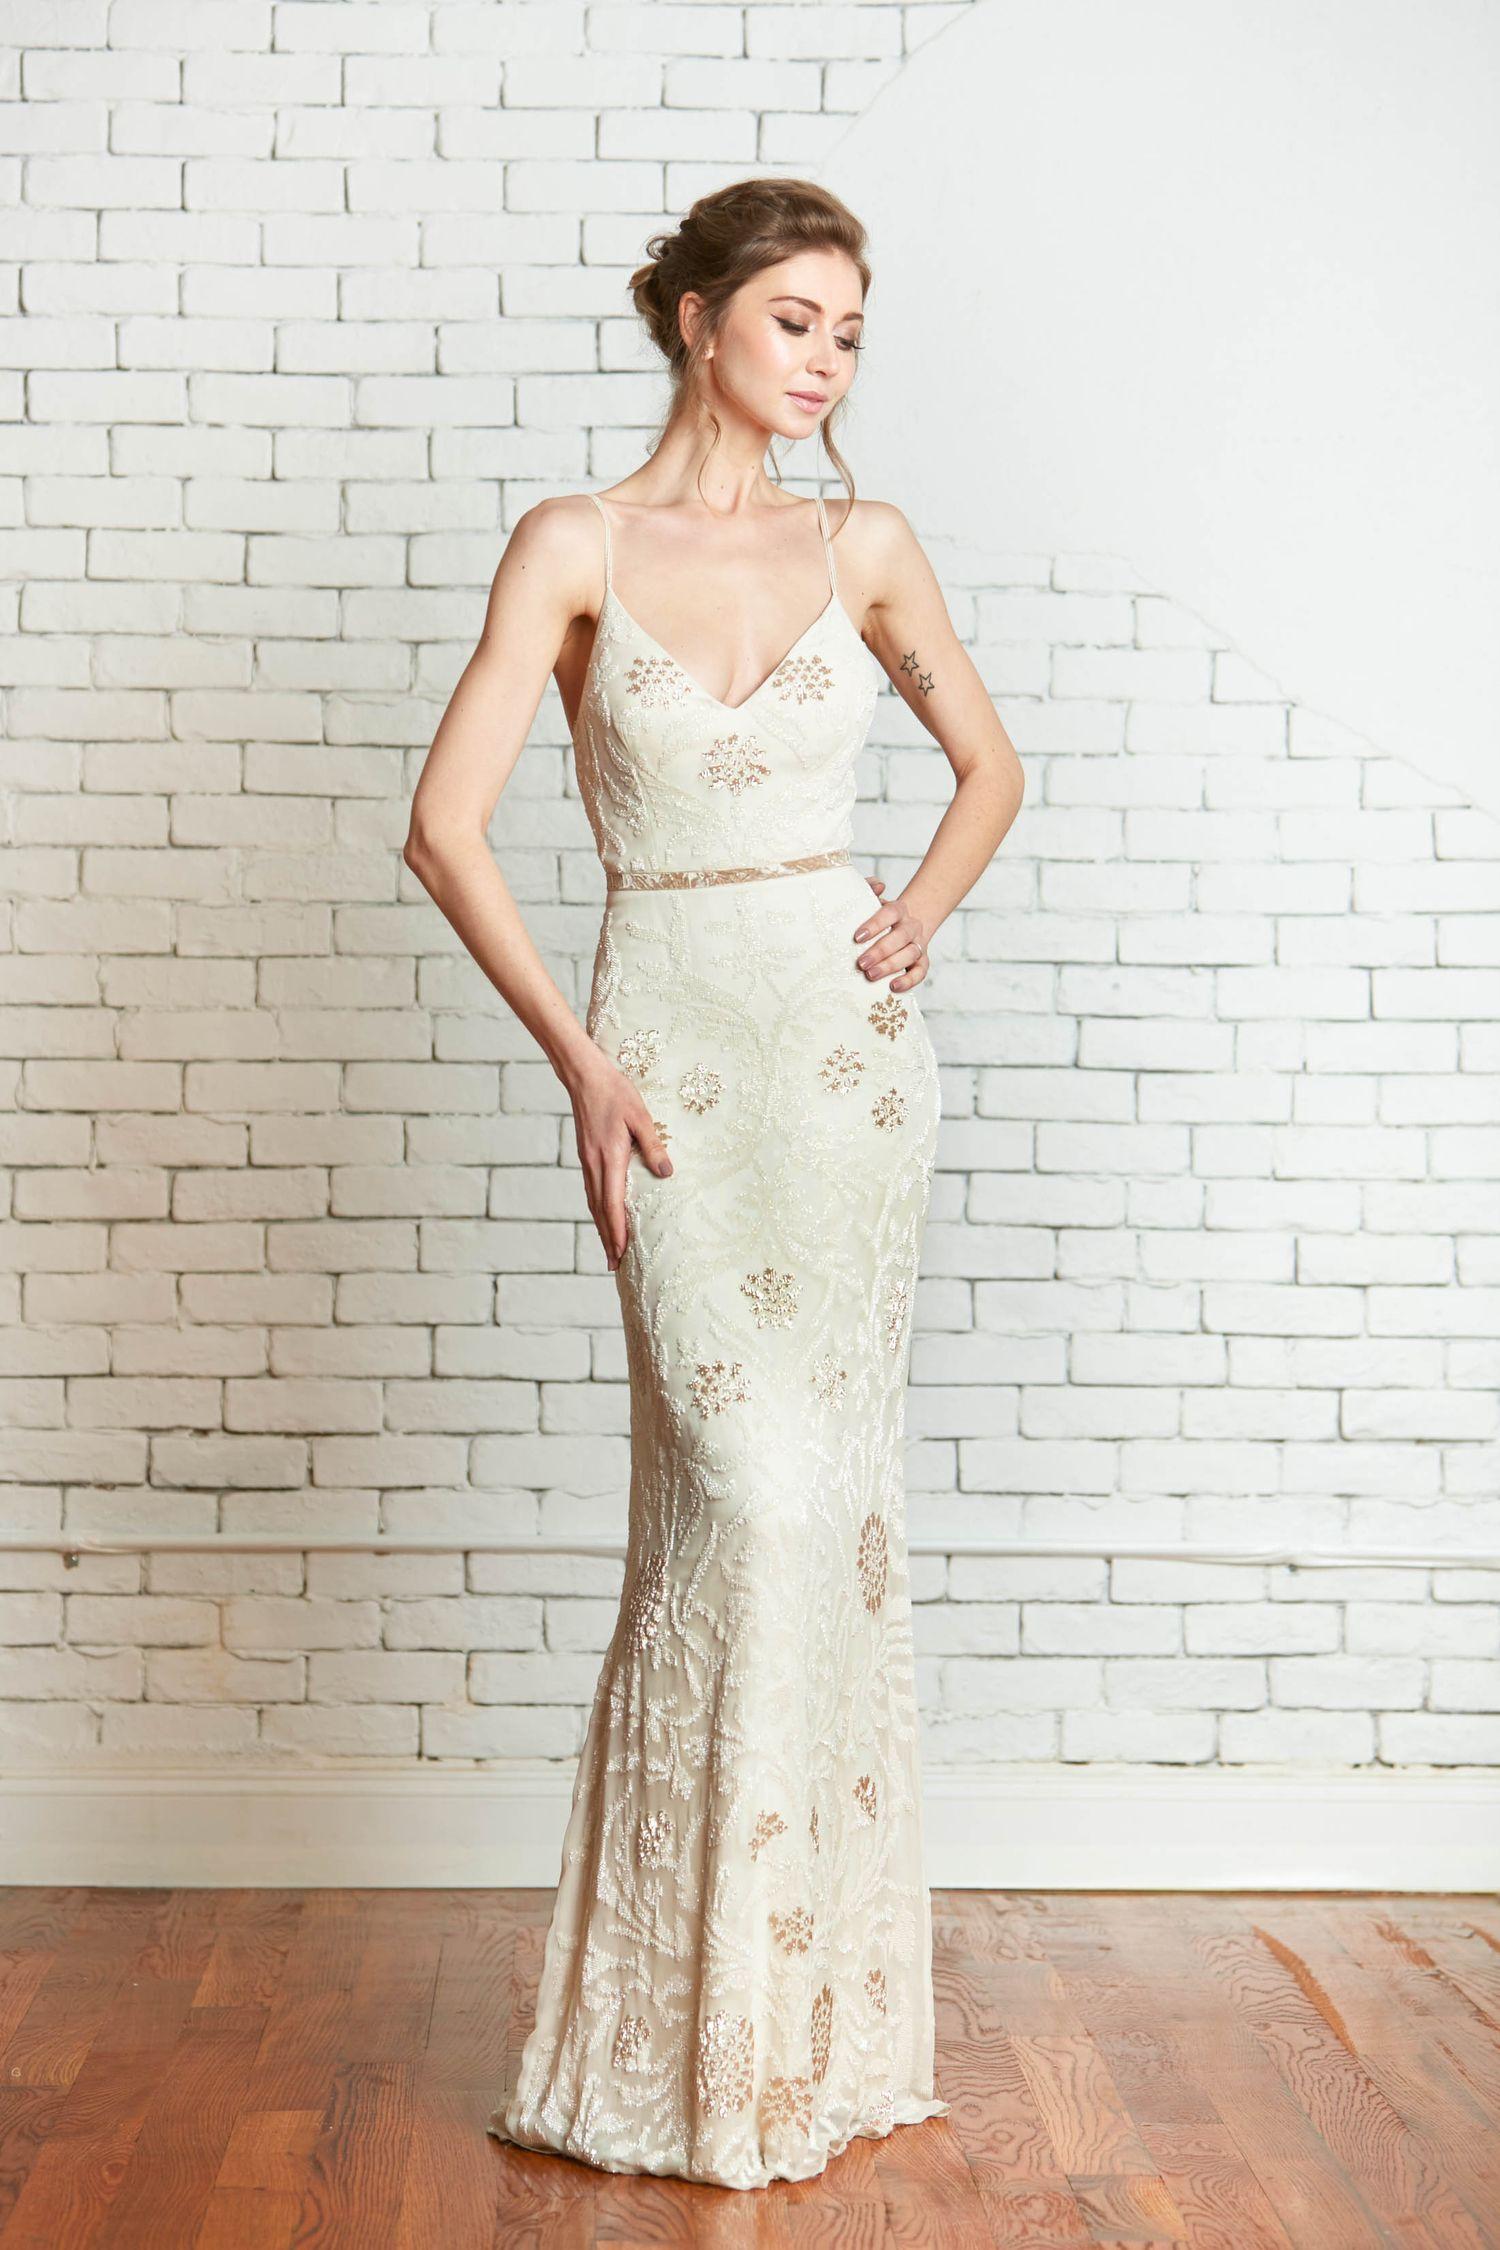 Schone bridalg wedding dresses pinterest wedding dress